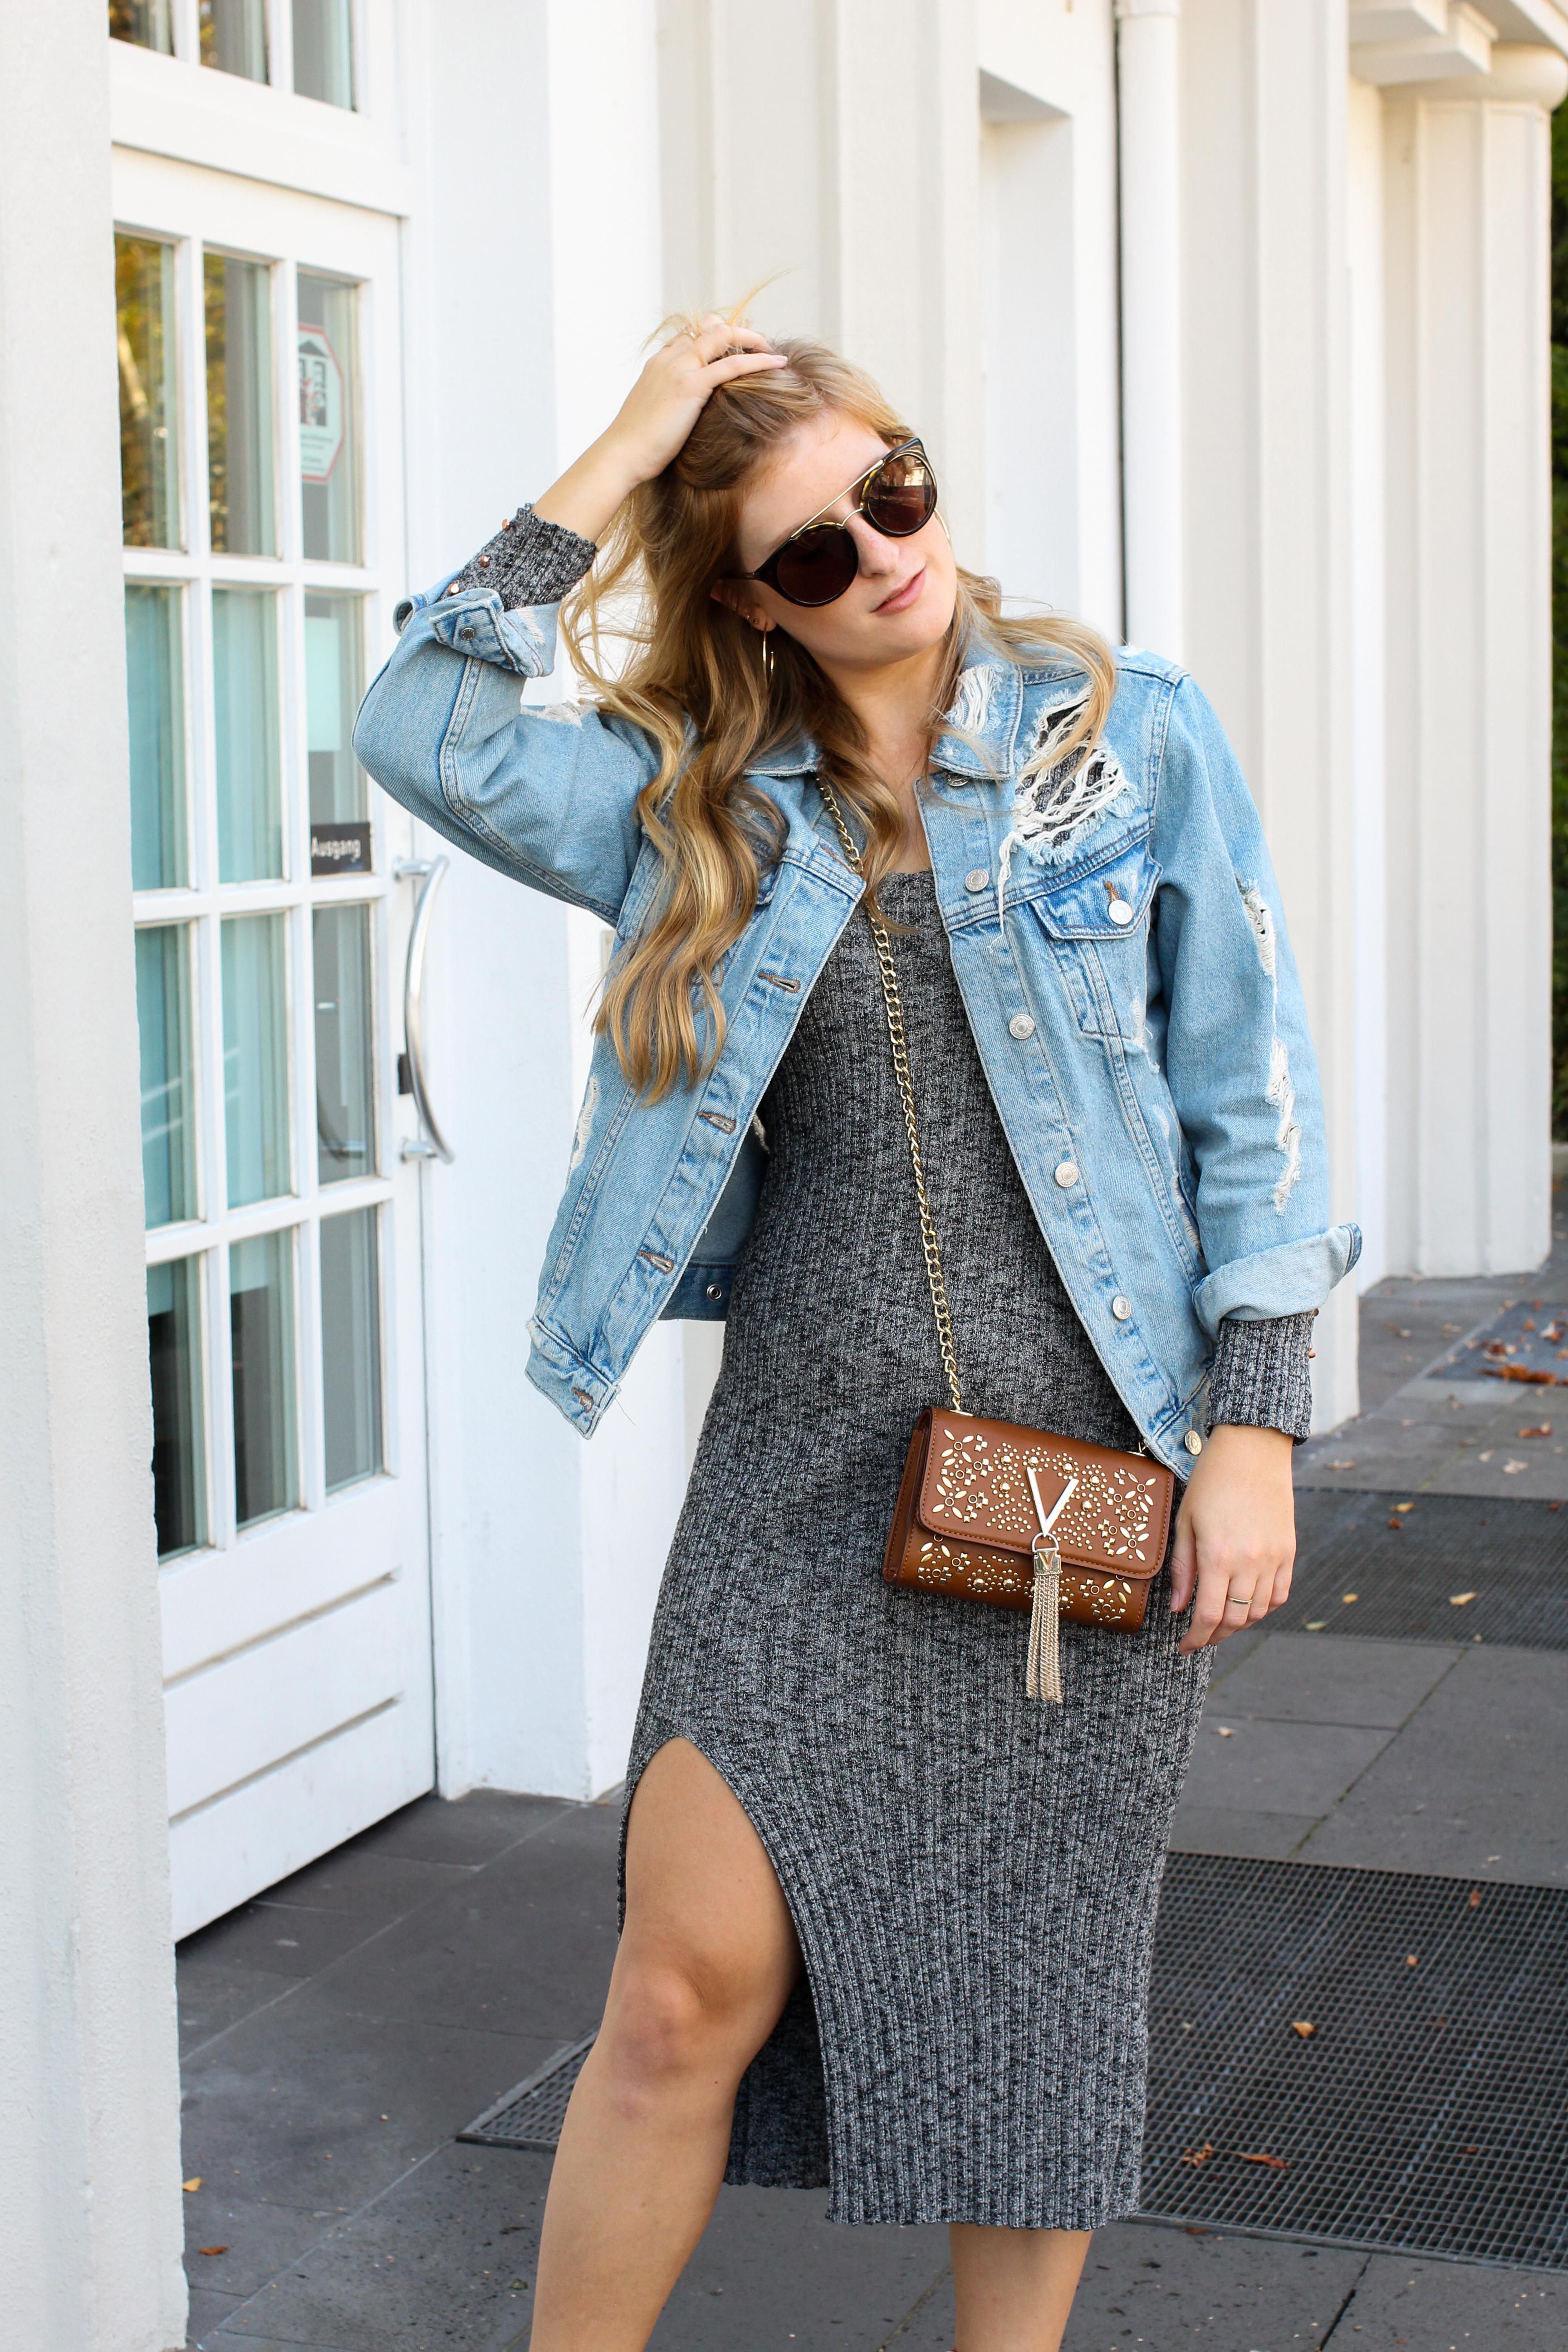 Herbstfavorit Wollkleid grau kombinieren Outfit rosa samt Heels Stiefeletten Jeansjacke Valentino Handbags Fashion Blog Bonn Herbstoutfit 8